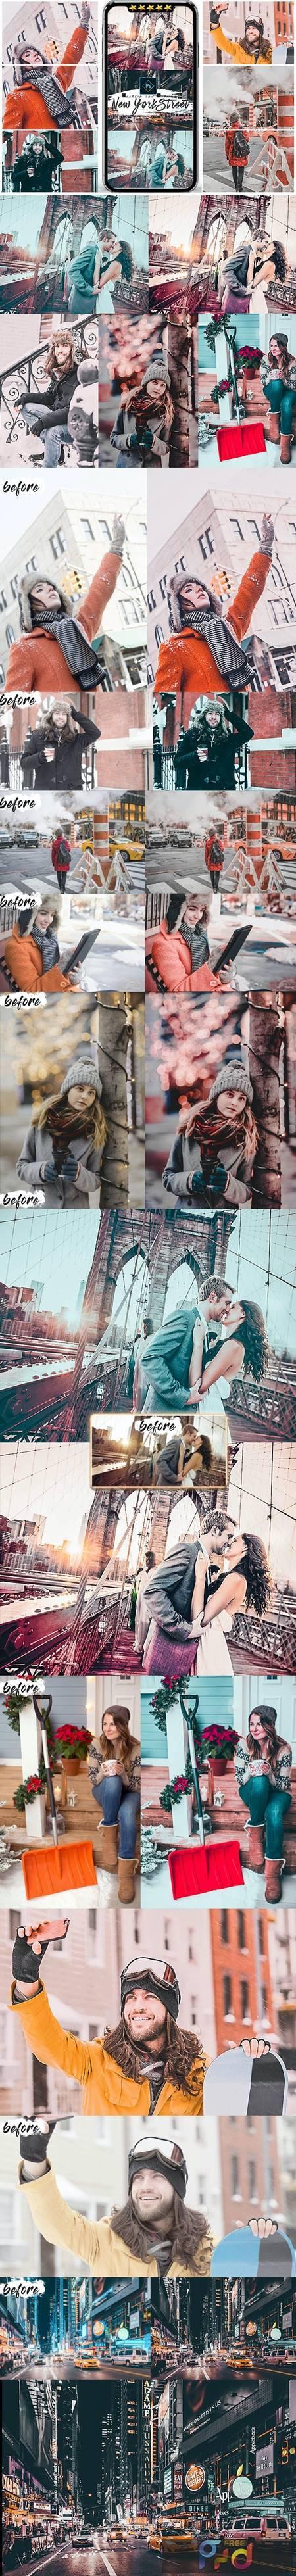 New York Street Photoshop Actions 27185178 1